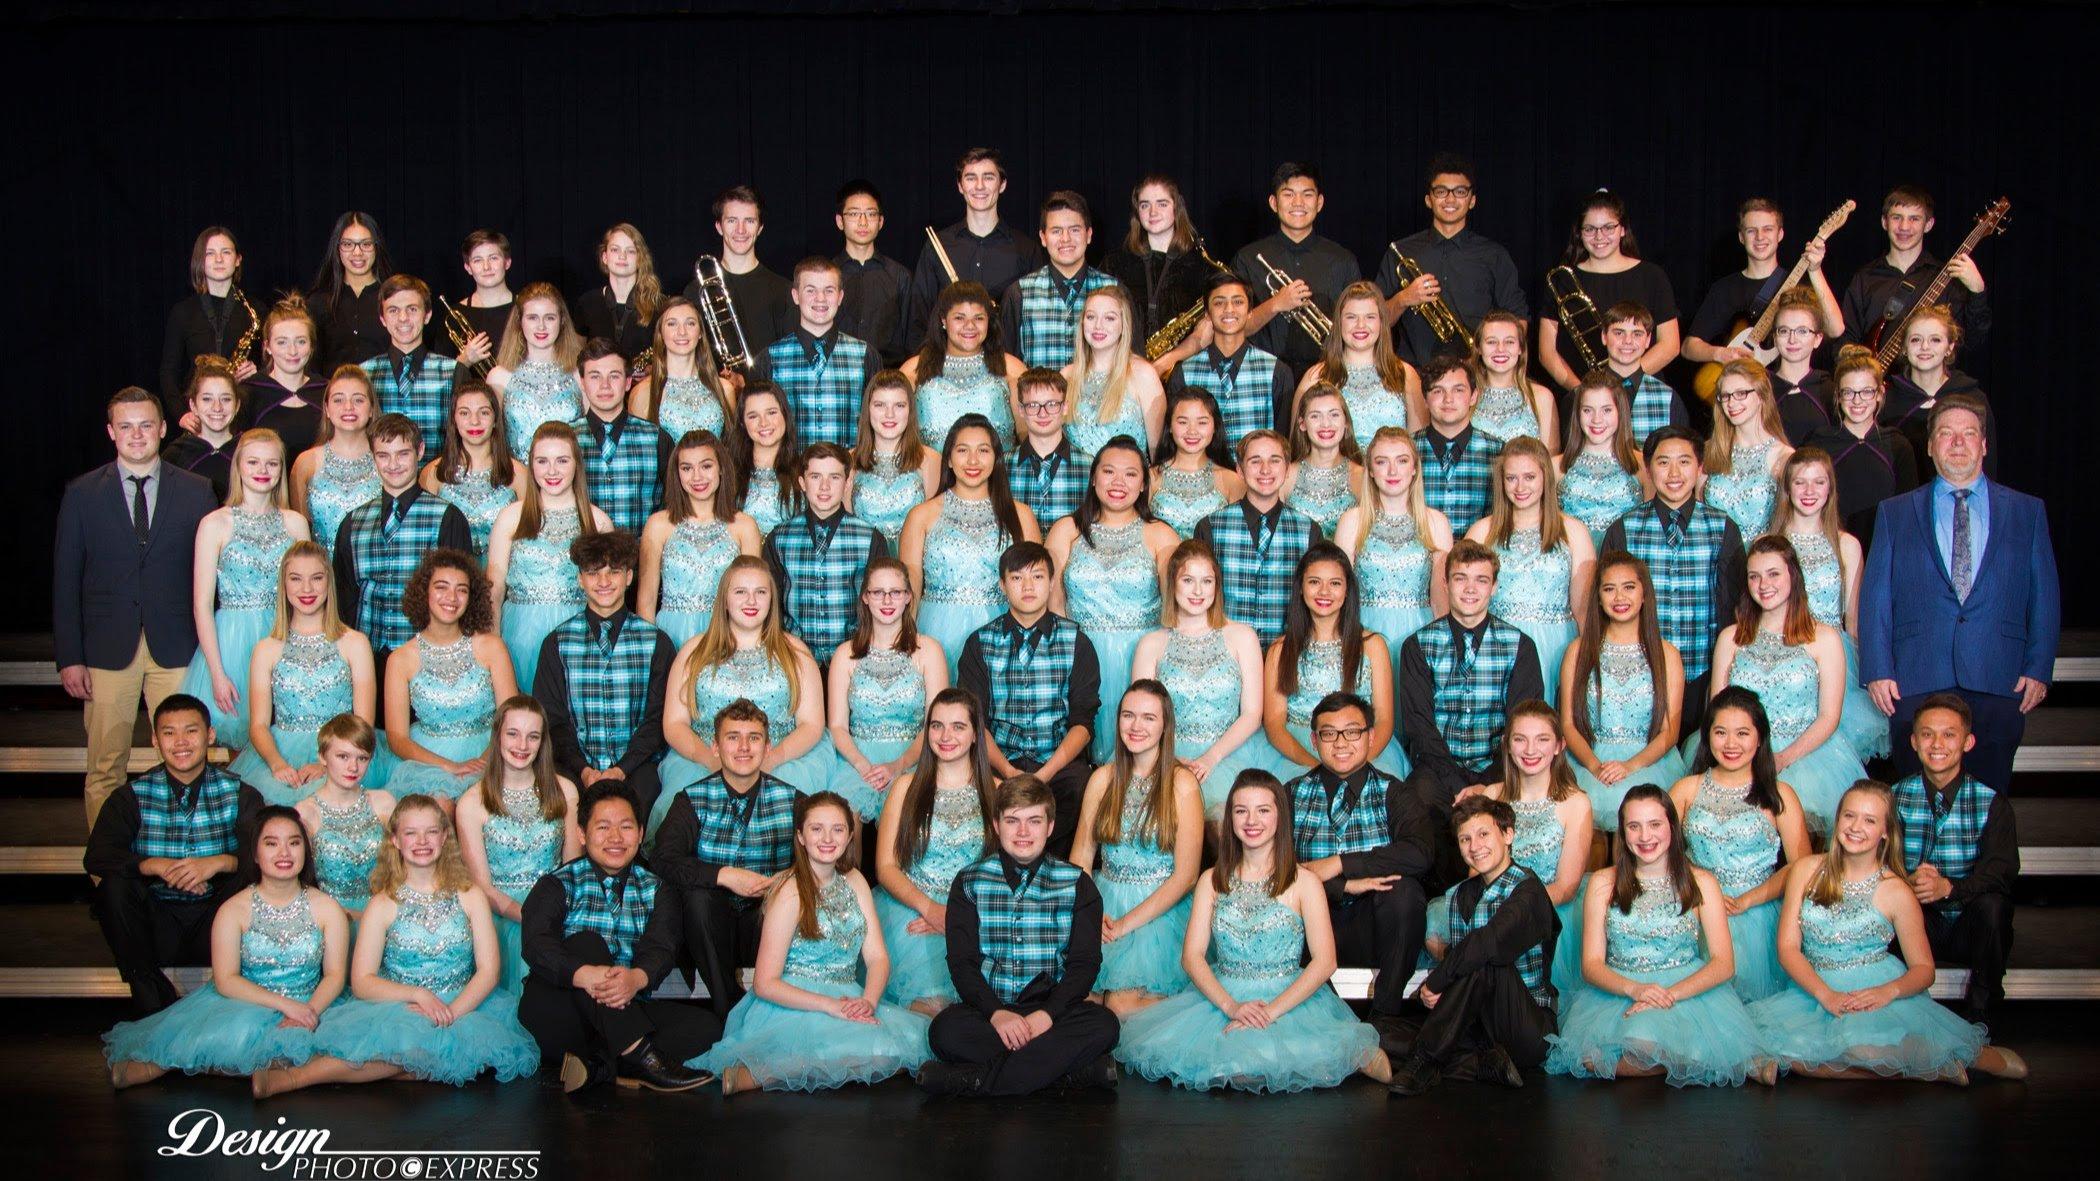 SCC: Viewing Choir - Express 2019